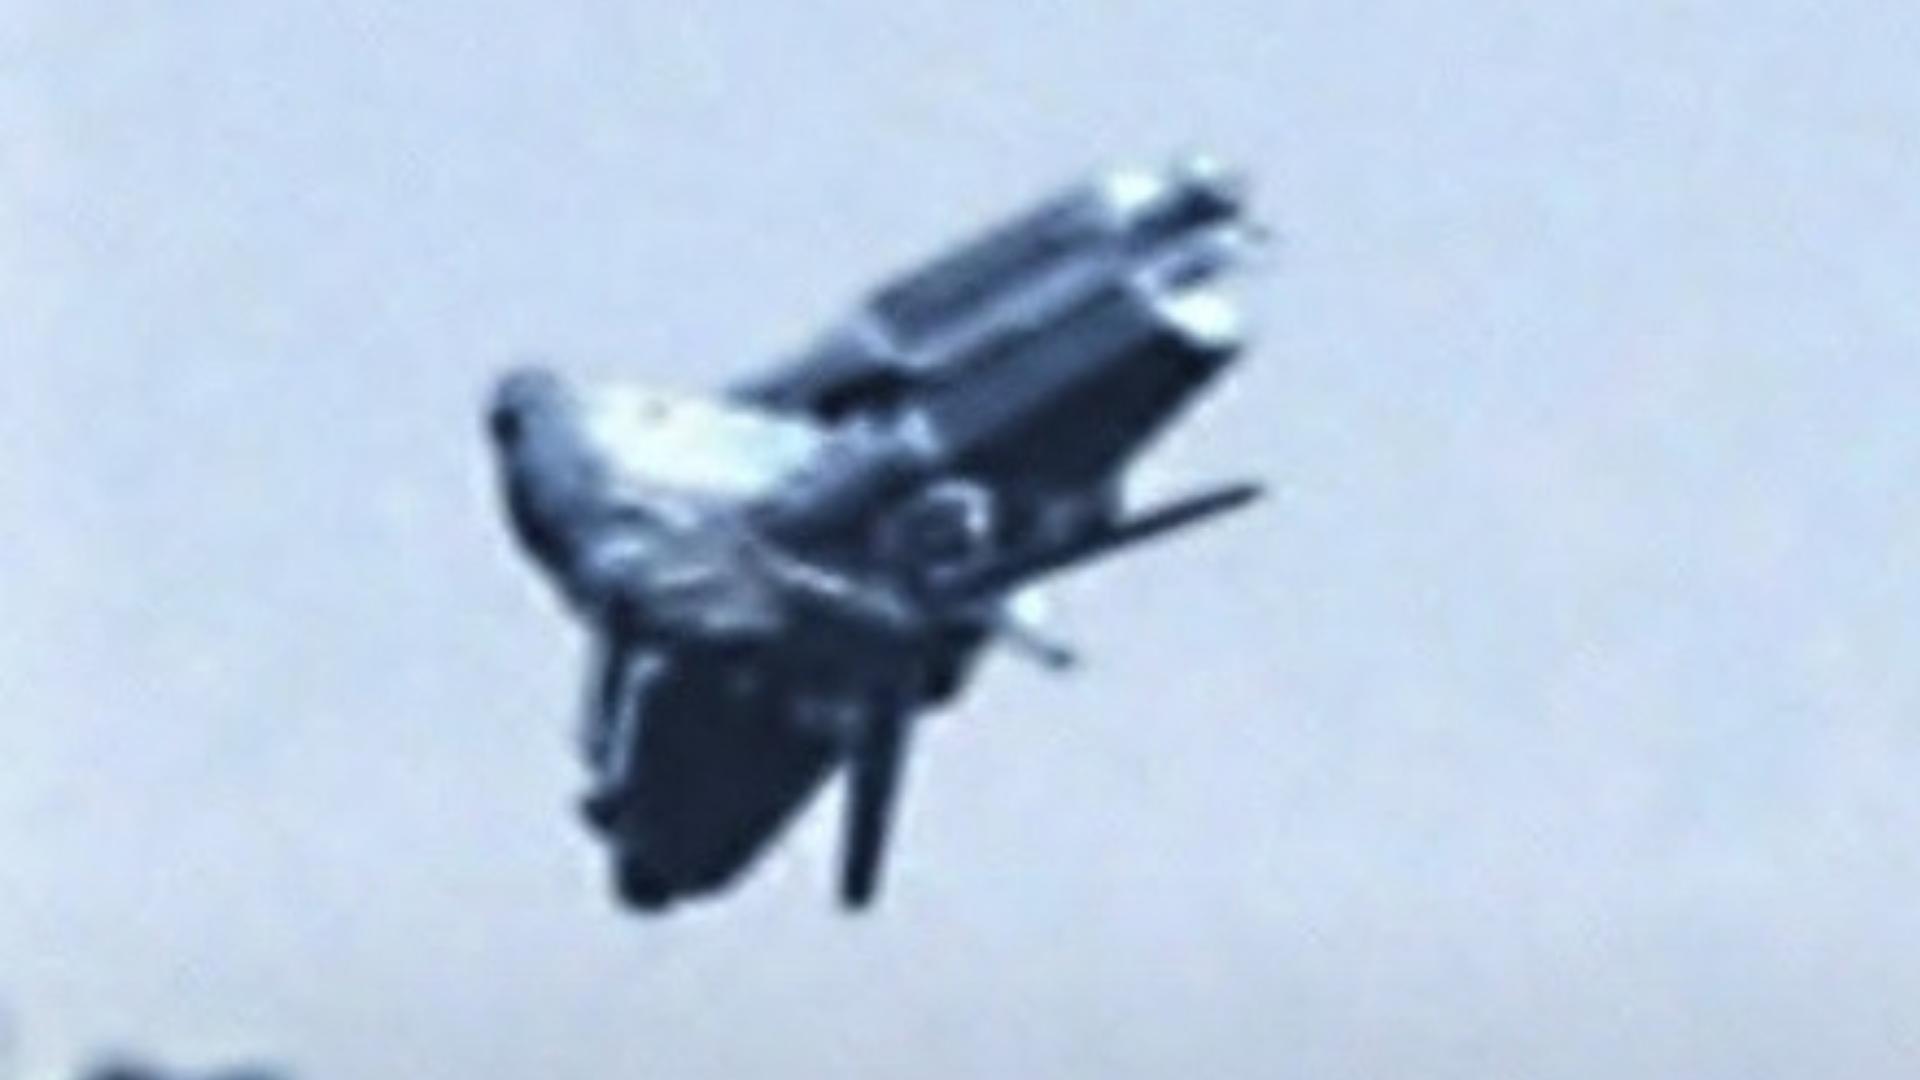 UFO Sighting Over Riyadh, Saudi Arabia Mysterious UFO